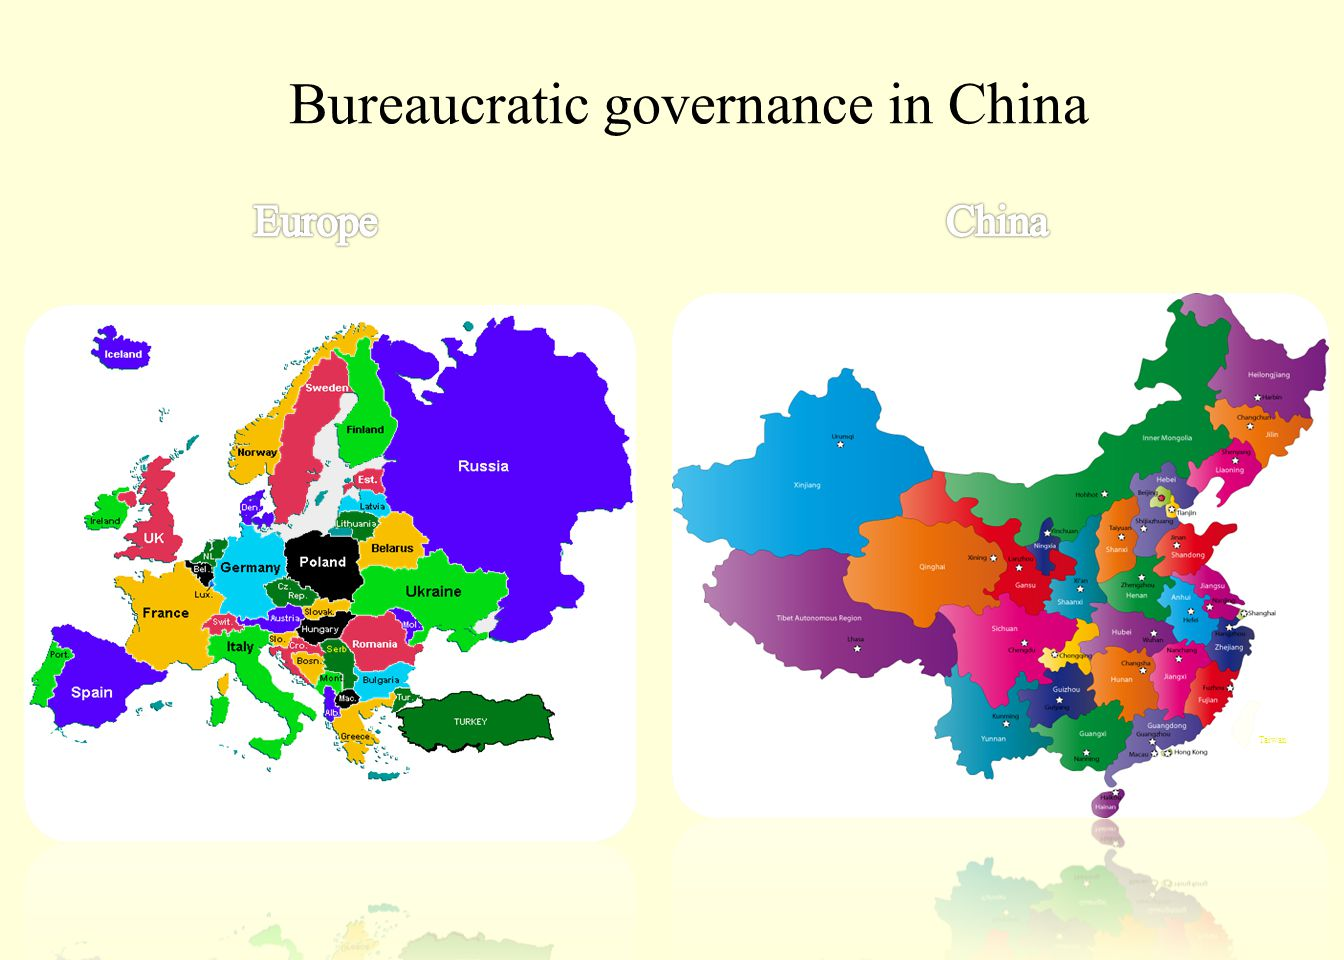 Bureaucratic governance in China